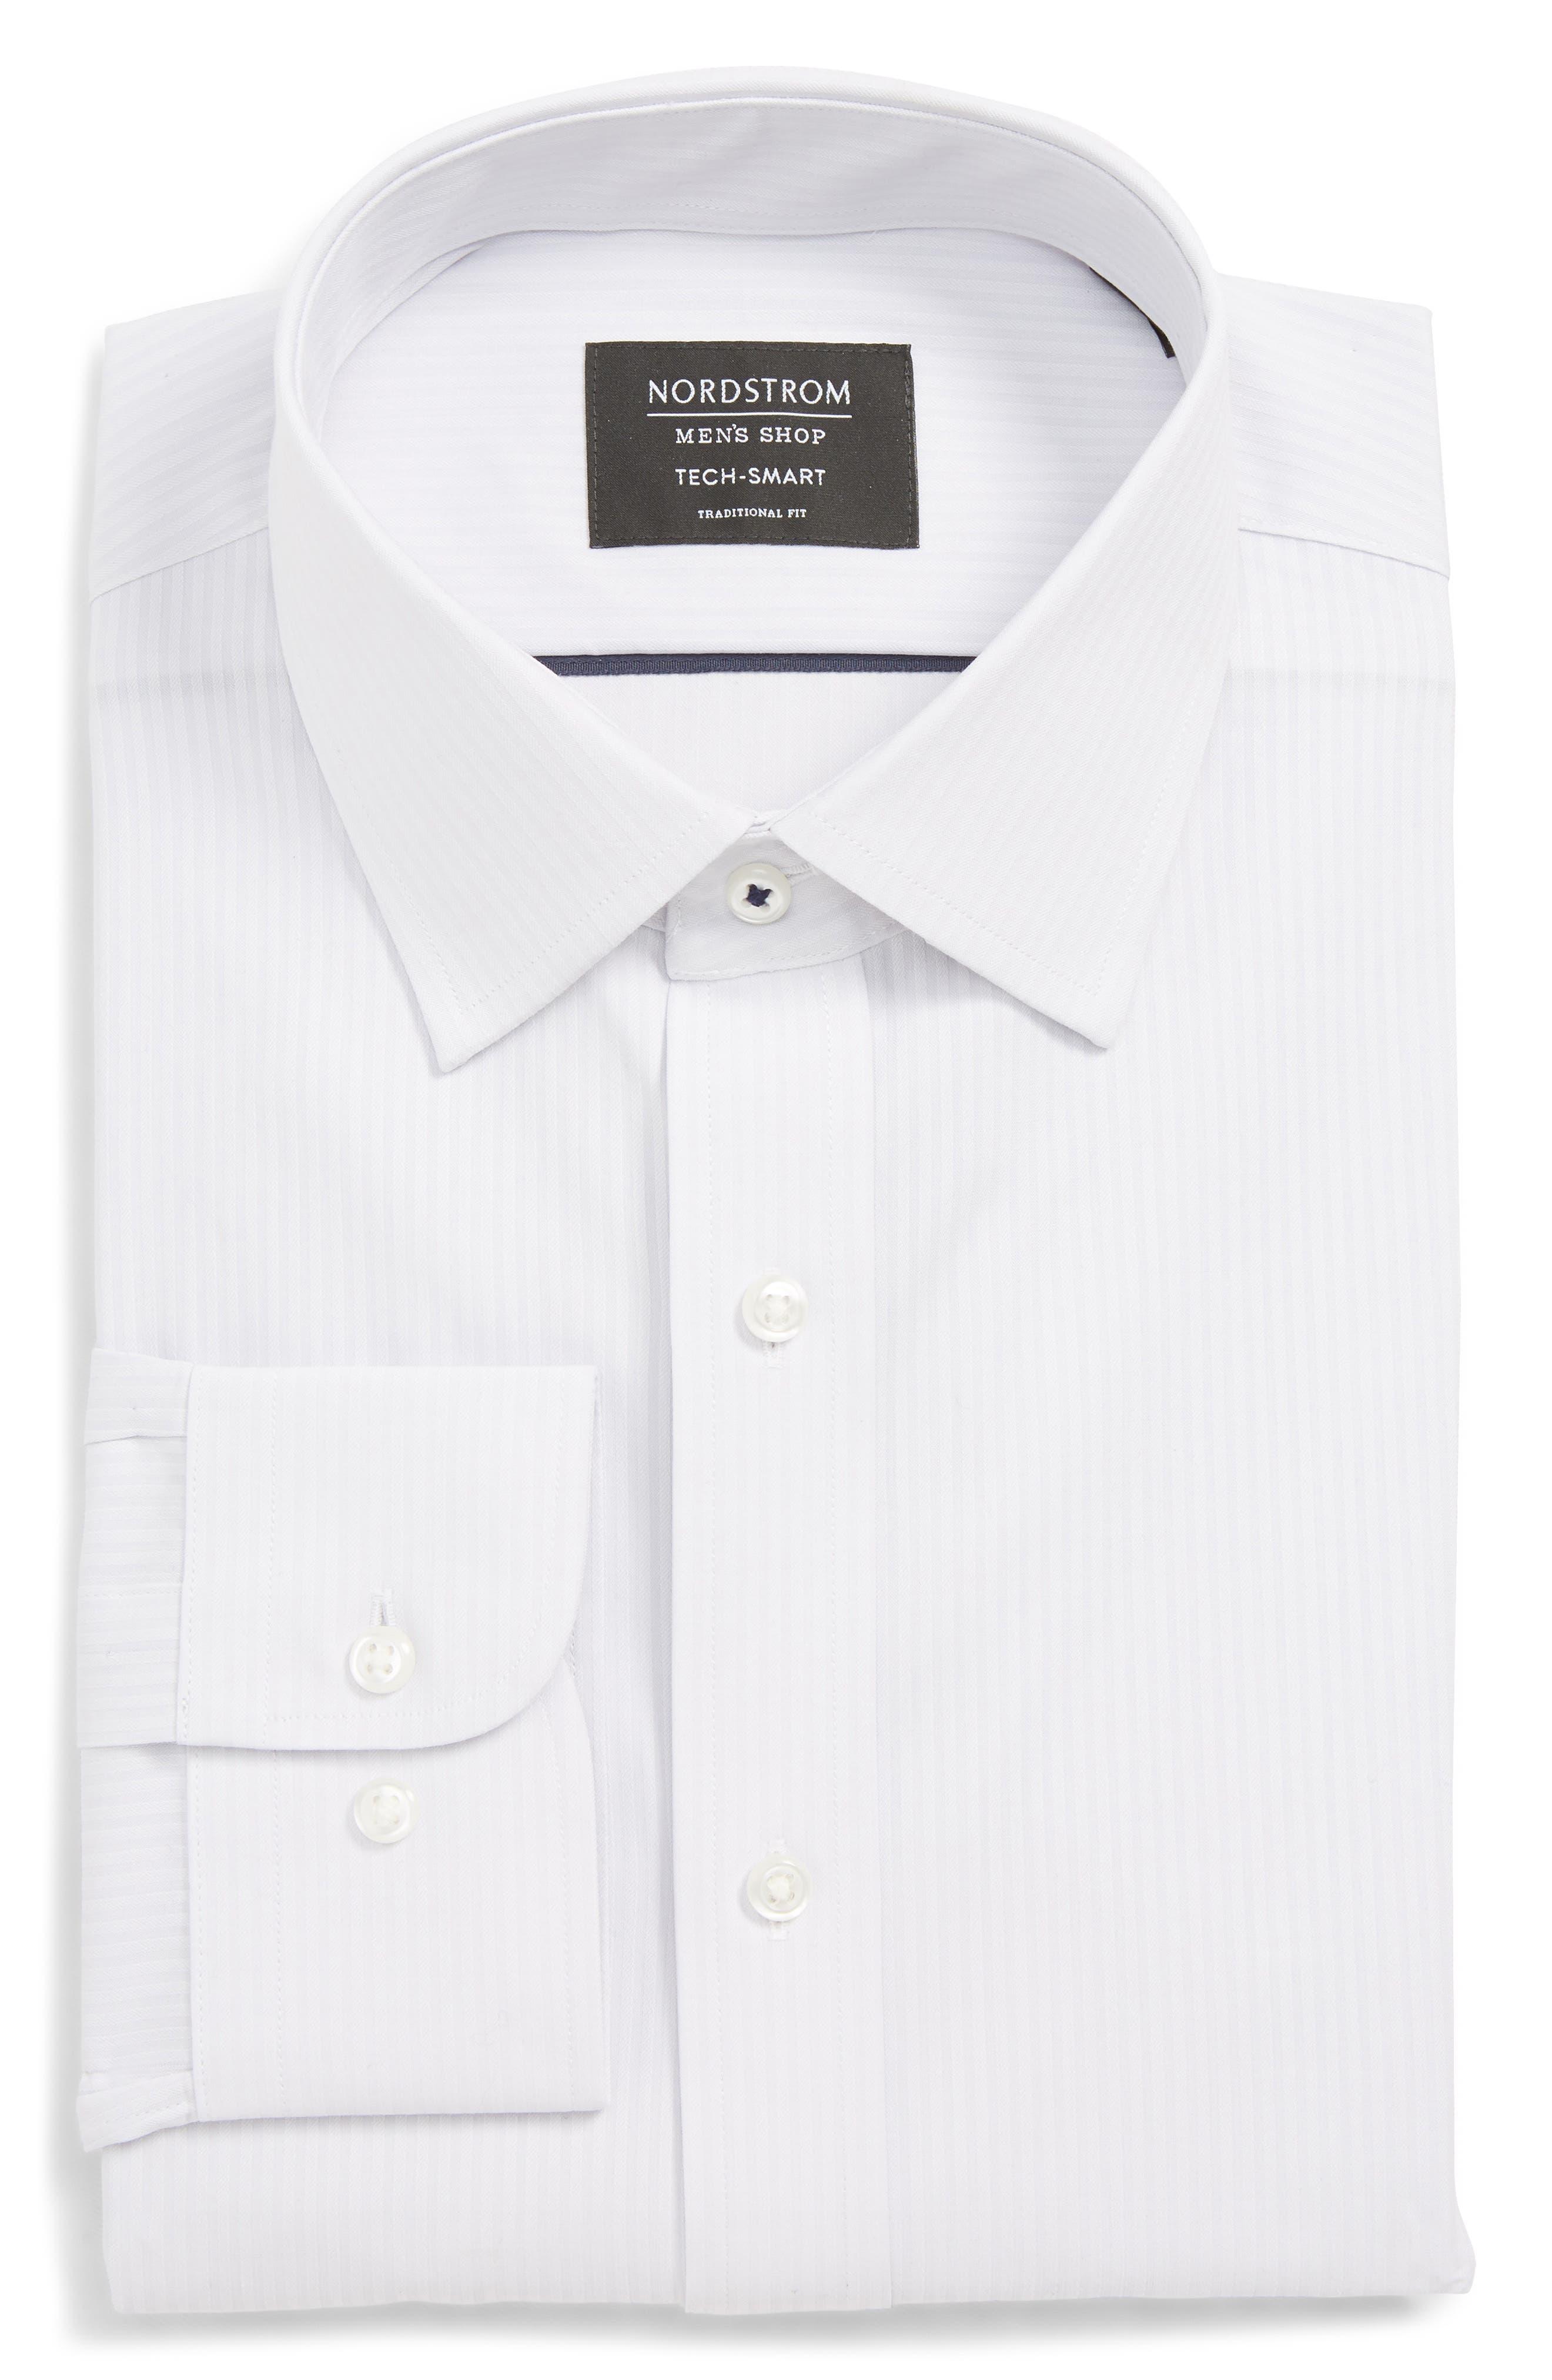 Tech-Smart Traditional Fit Stretch Stripe Dress Shirt,                         Main,                         color, GREY MICRO